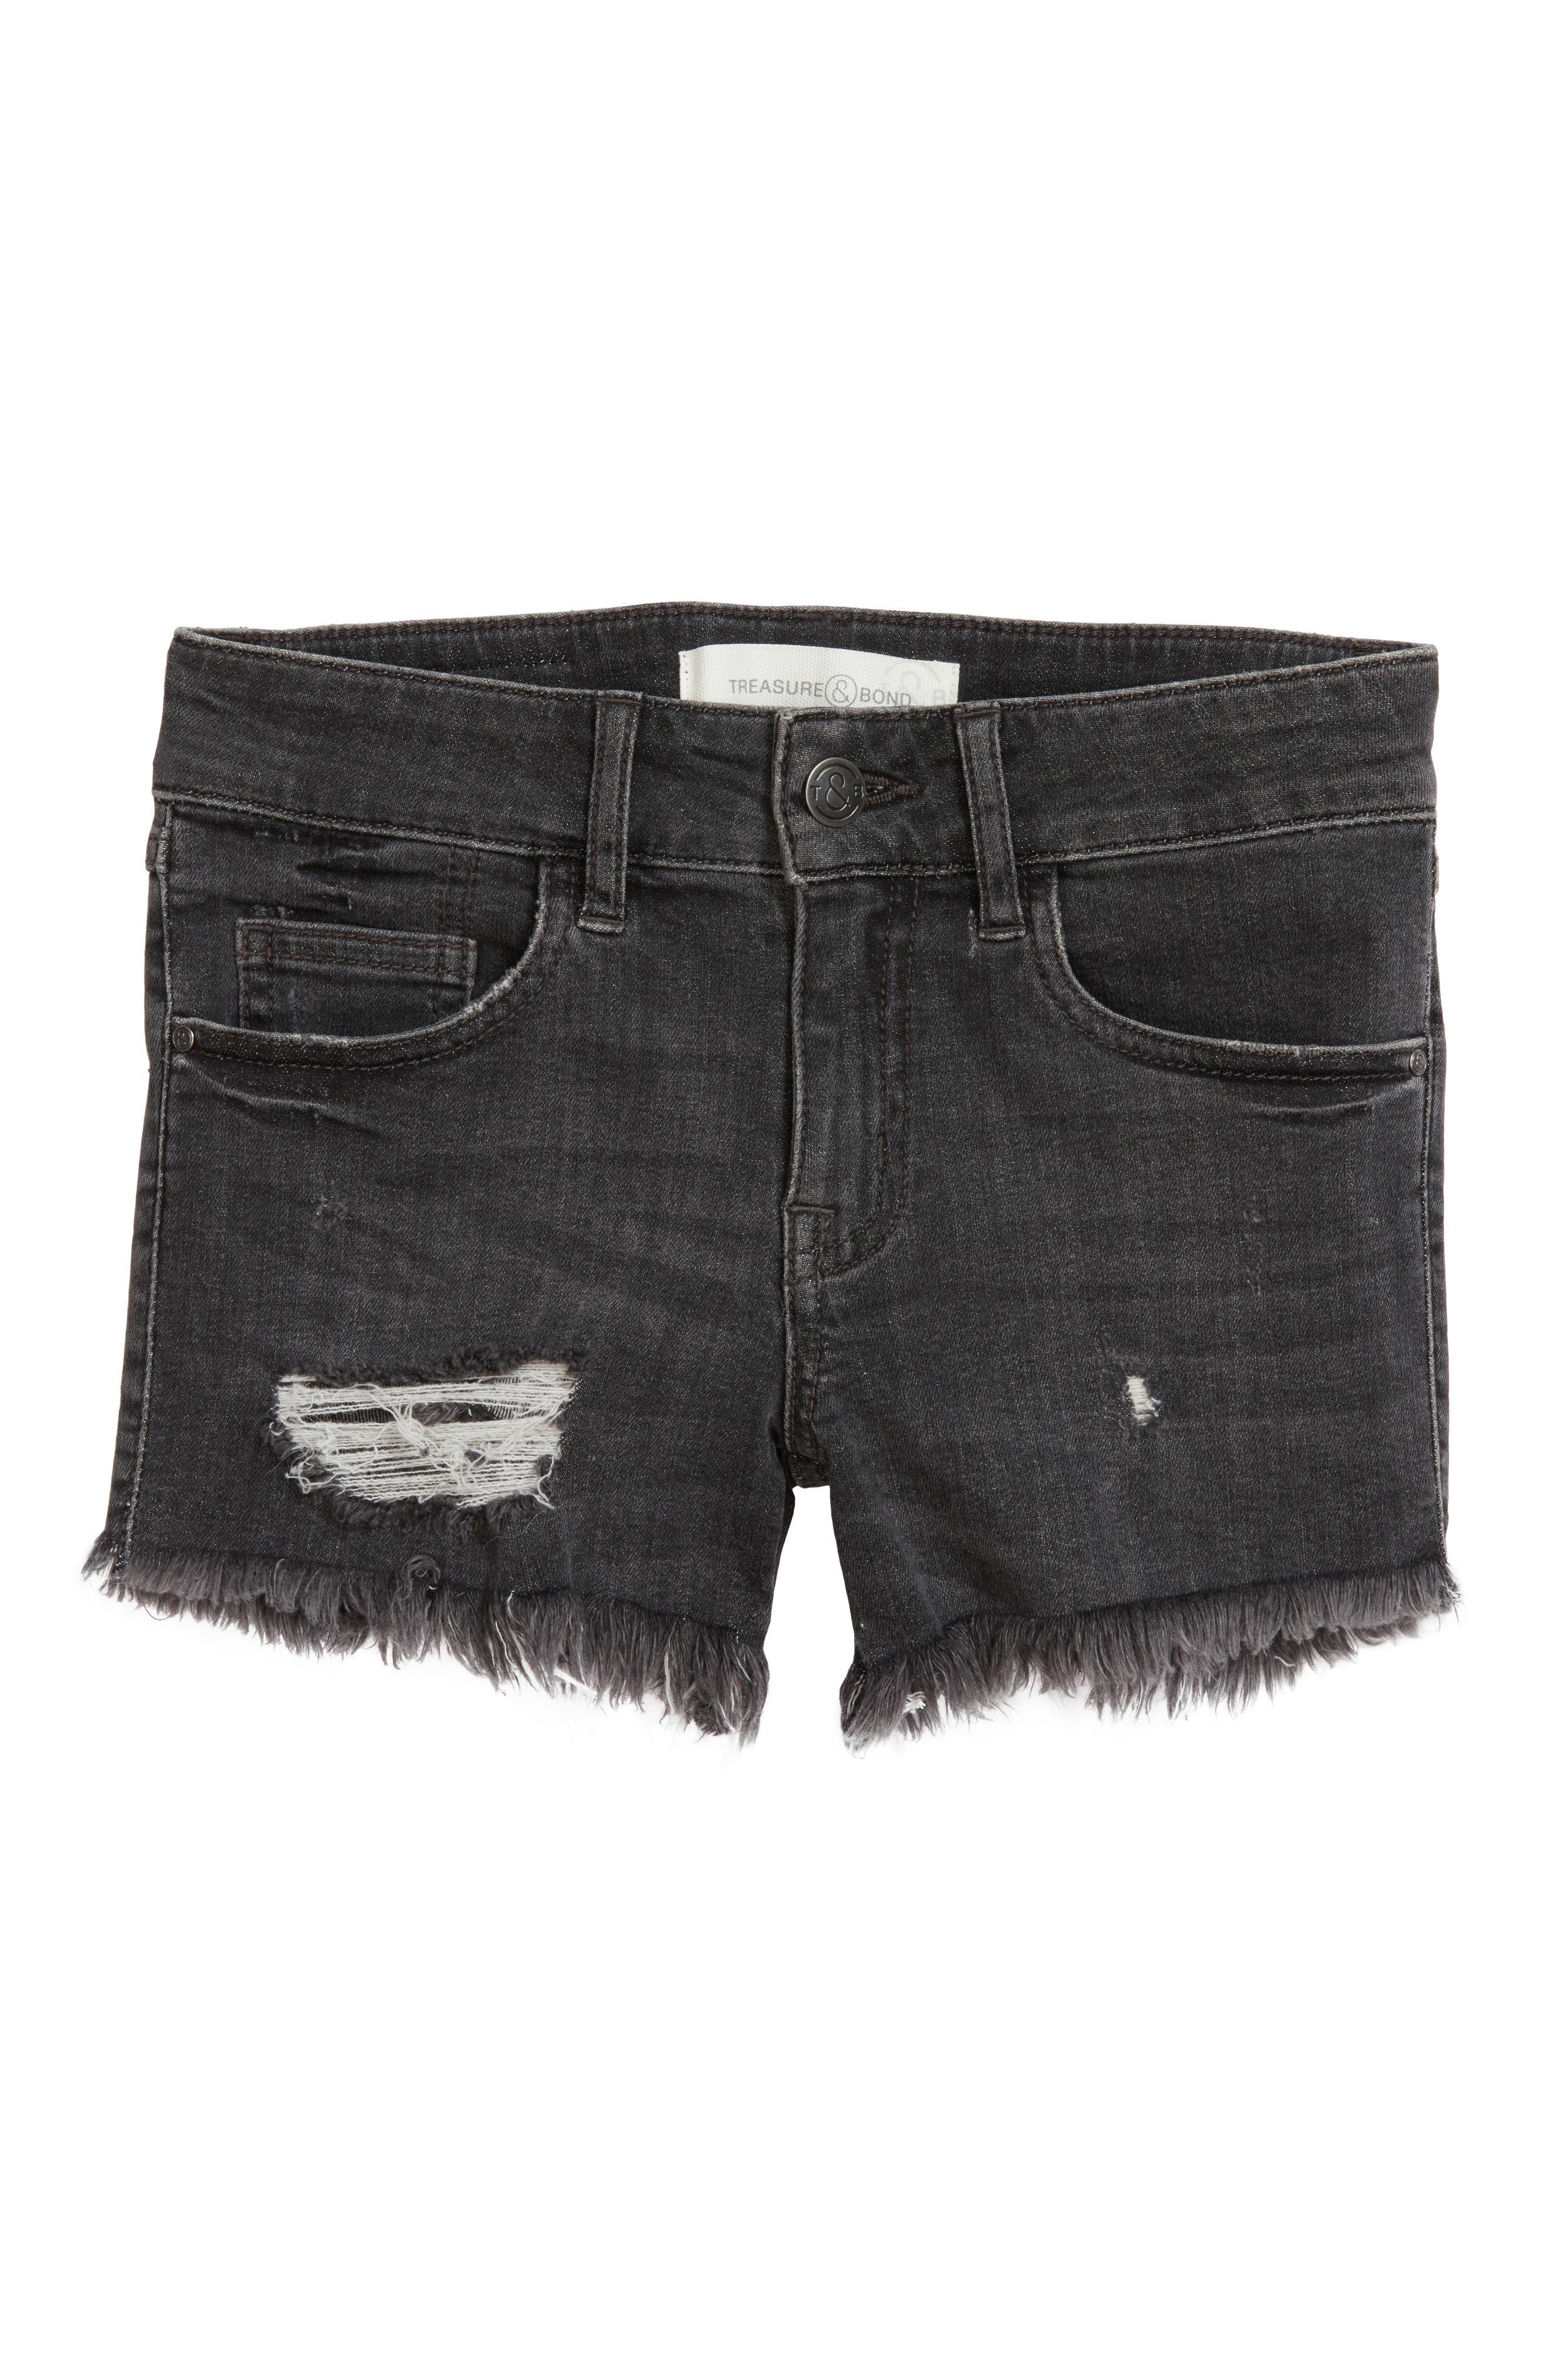 TREASURE & BOND, Distressed Cutoff Denim Shorts, Main thumbnail 1, color, BLACK VINTAGE WASH